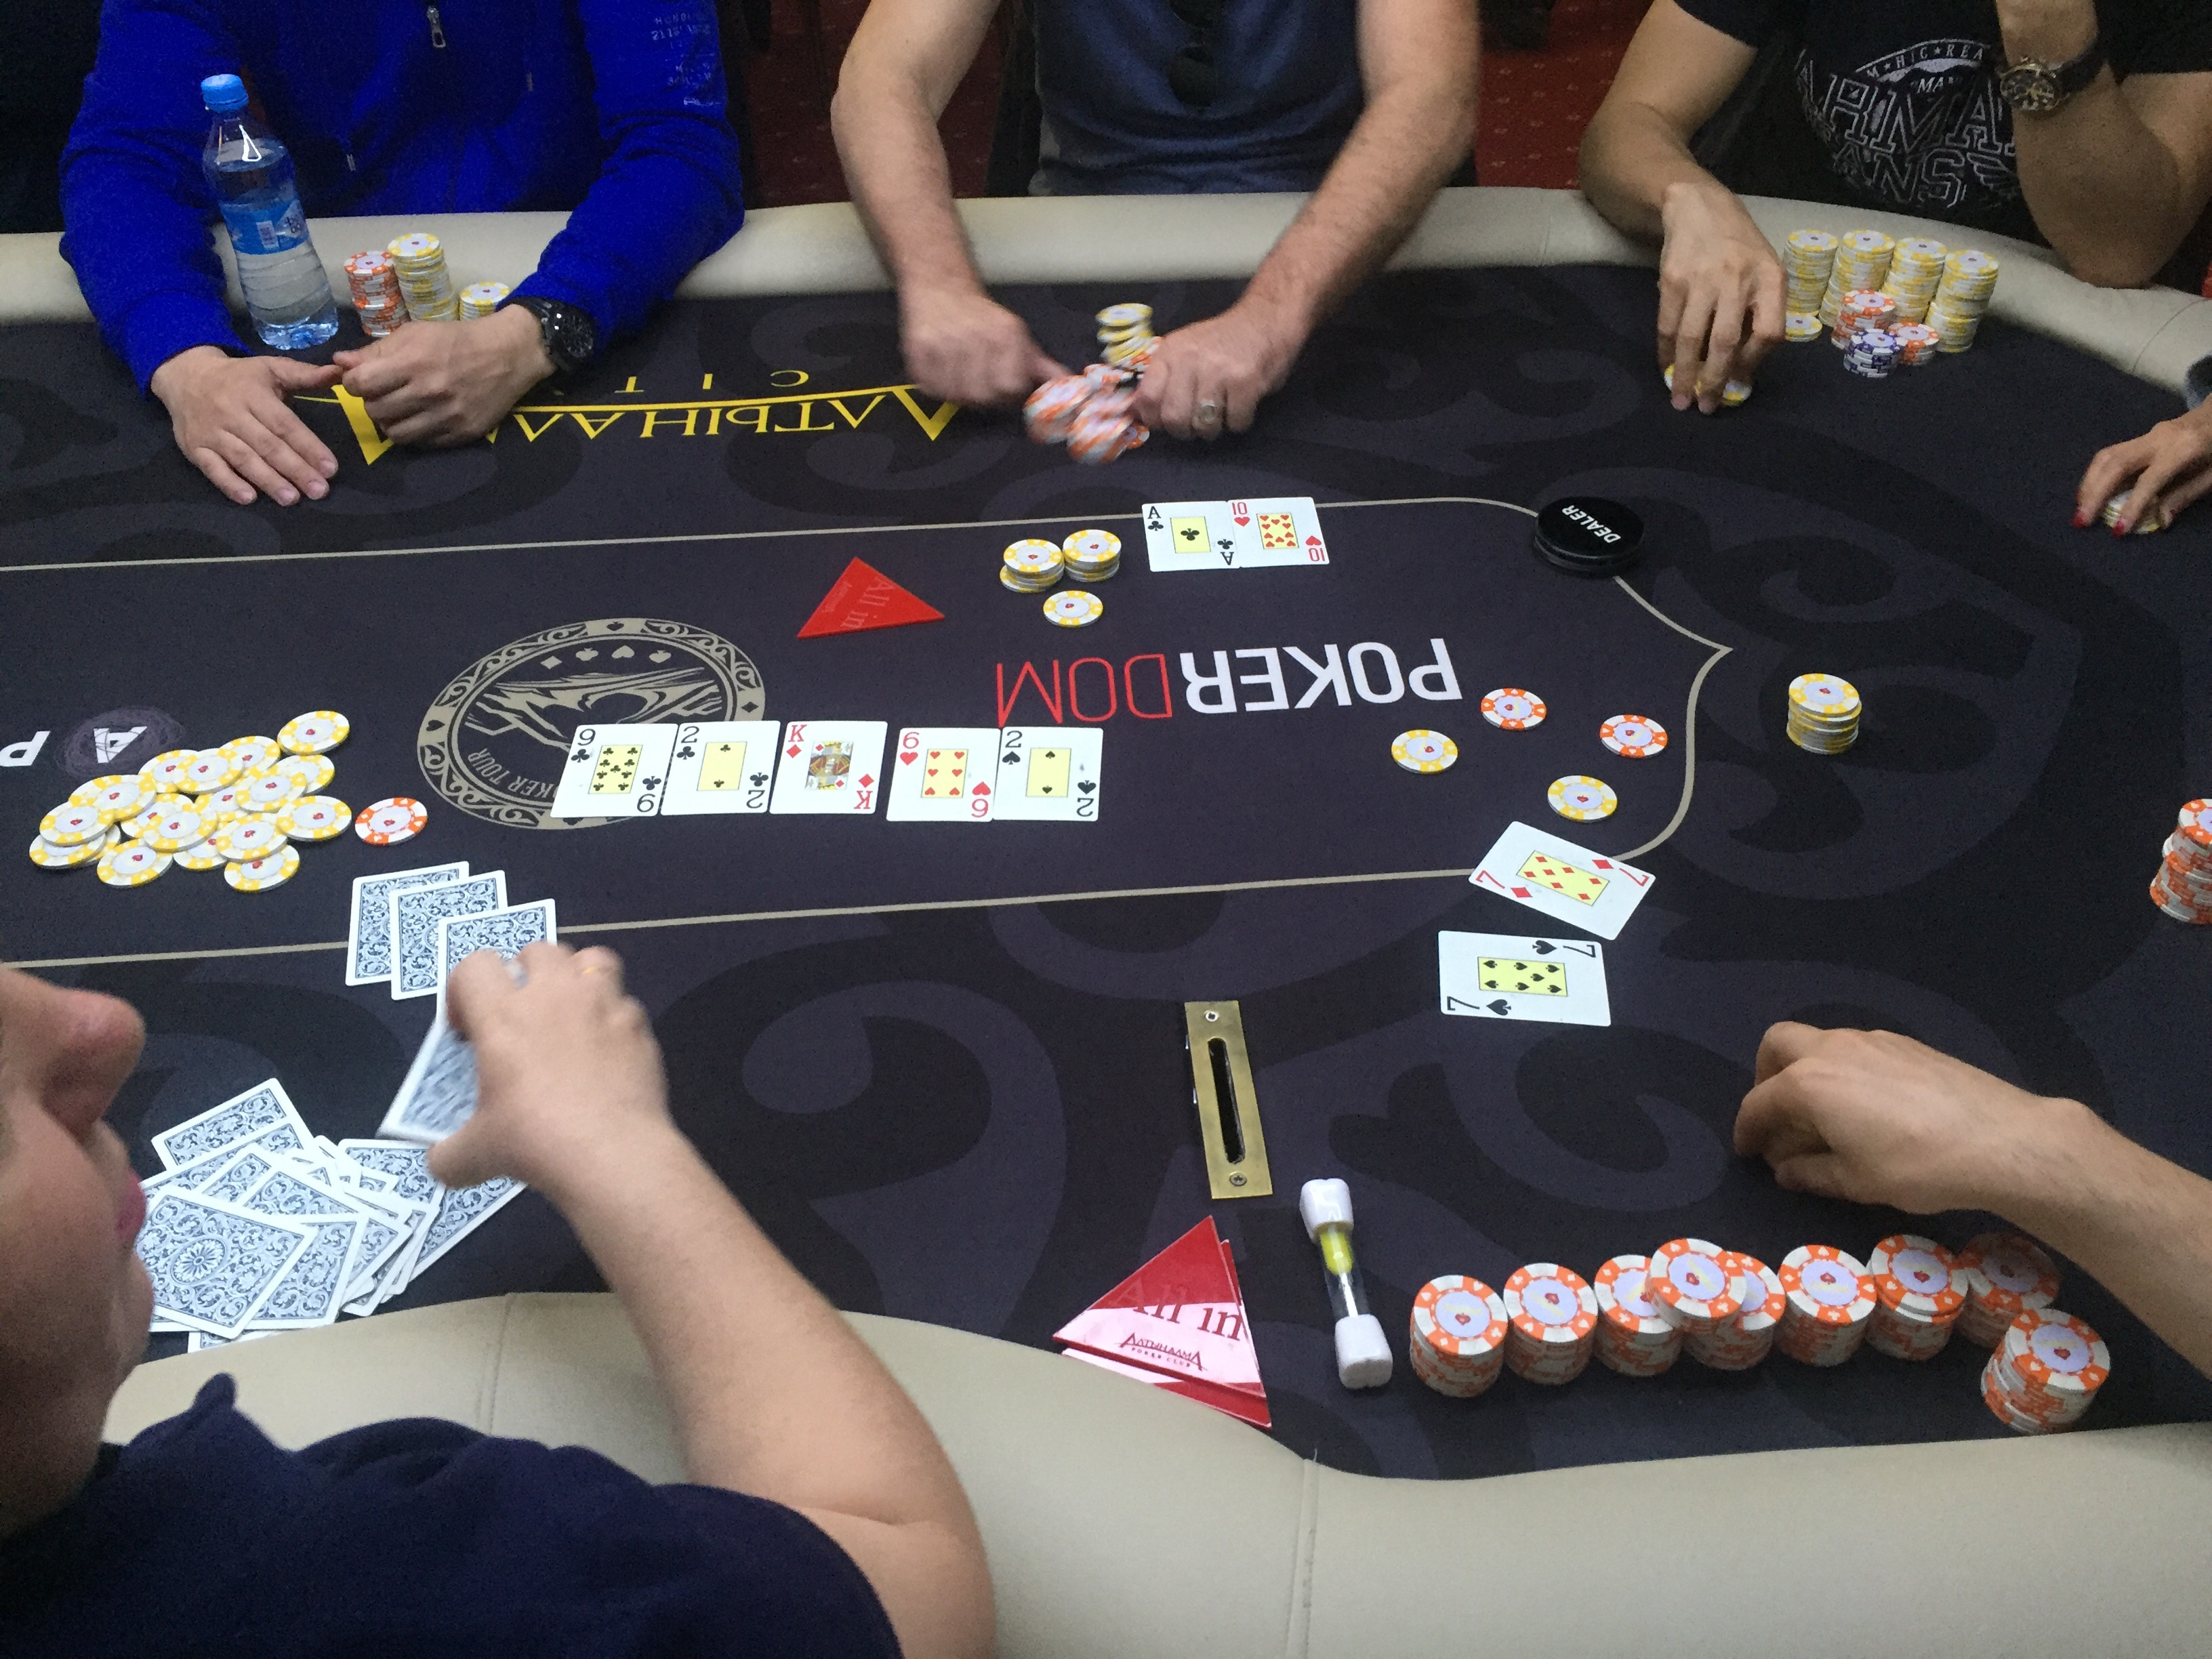 Онлайн казино с бонусом при регистрации рубли